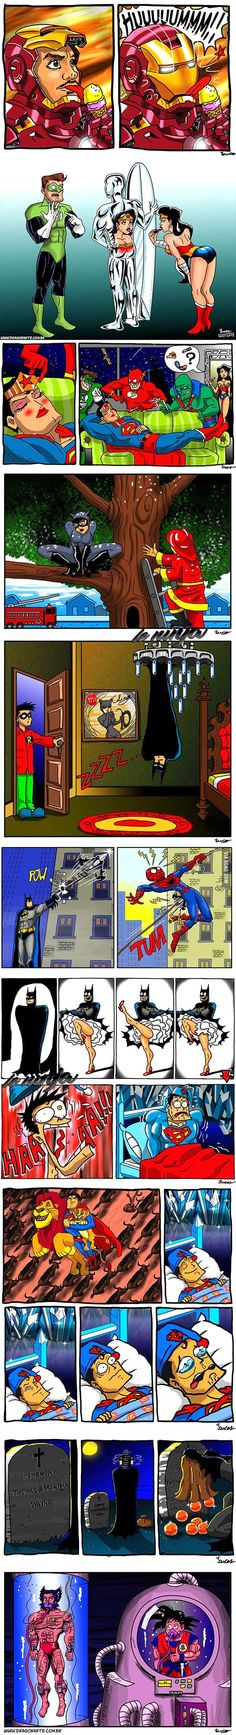 Super Heroes fun time comic